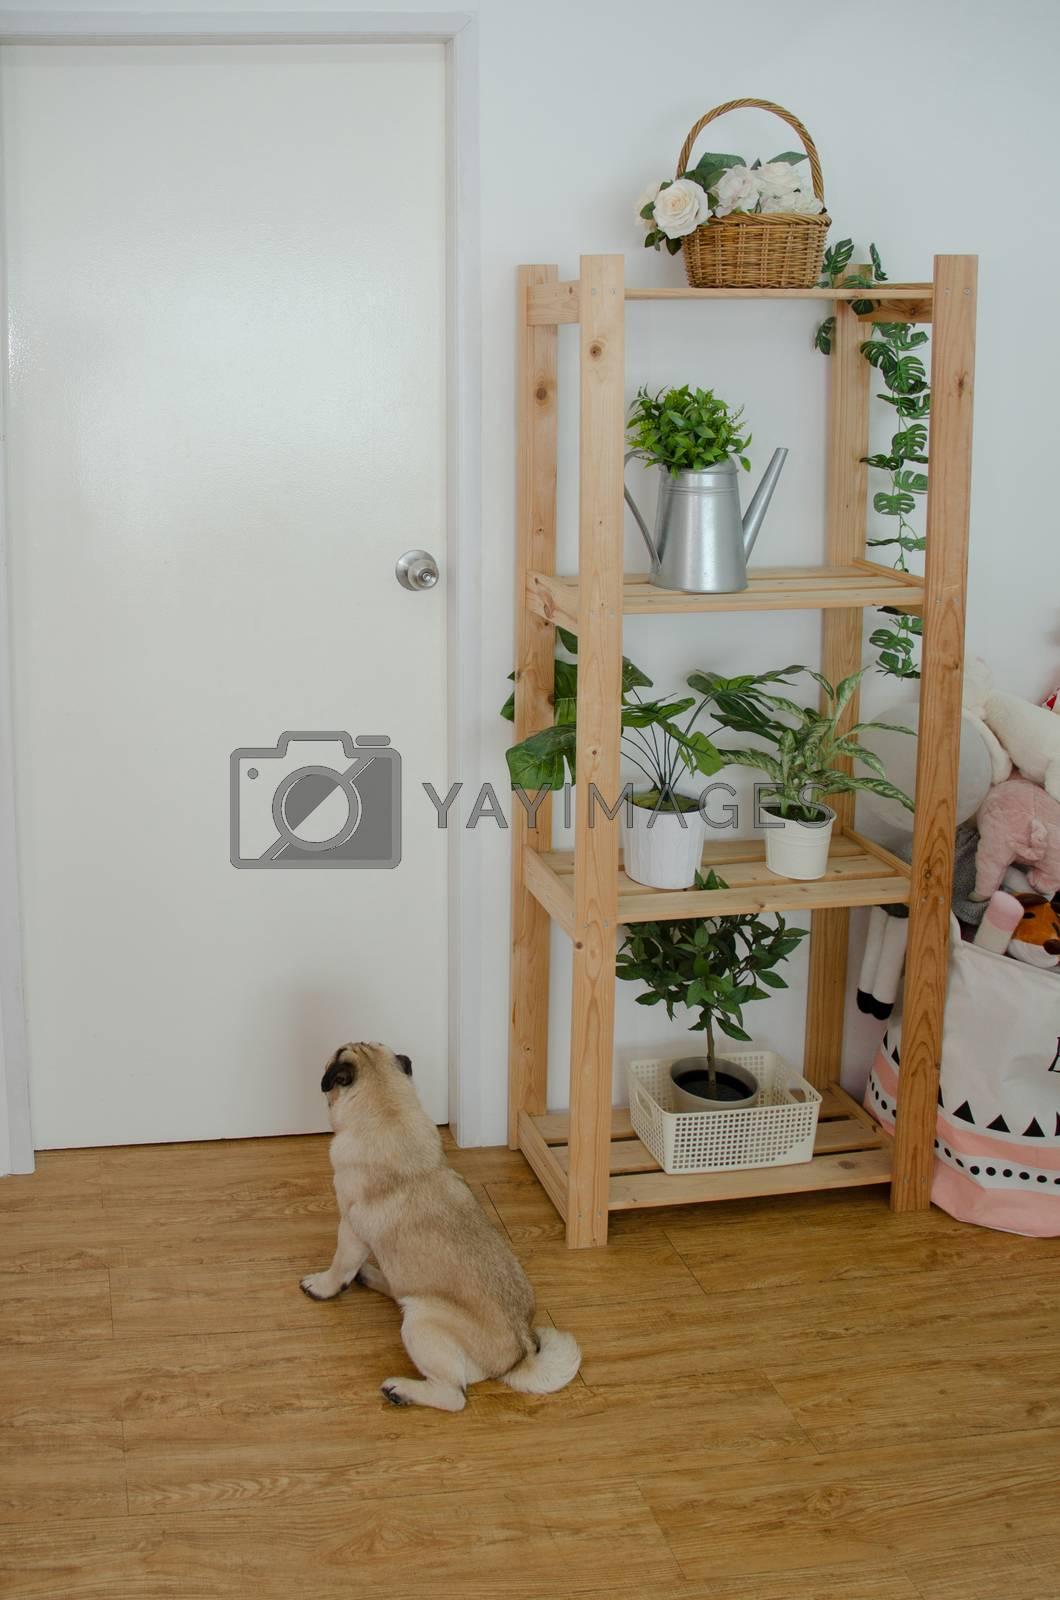 Cute dog by siriluk kongkead